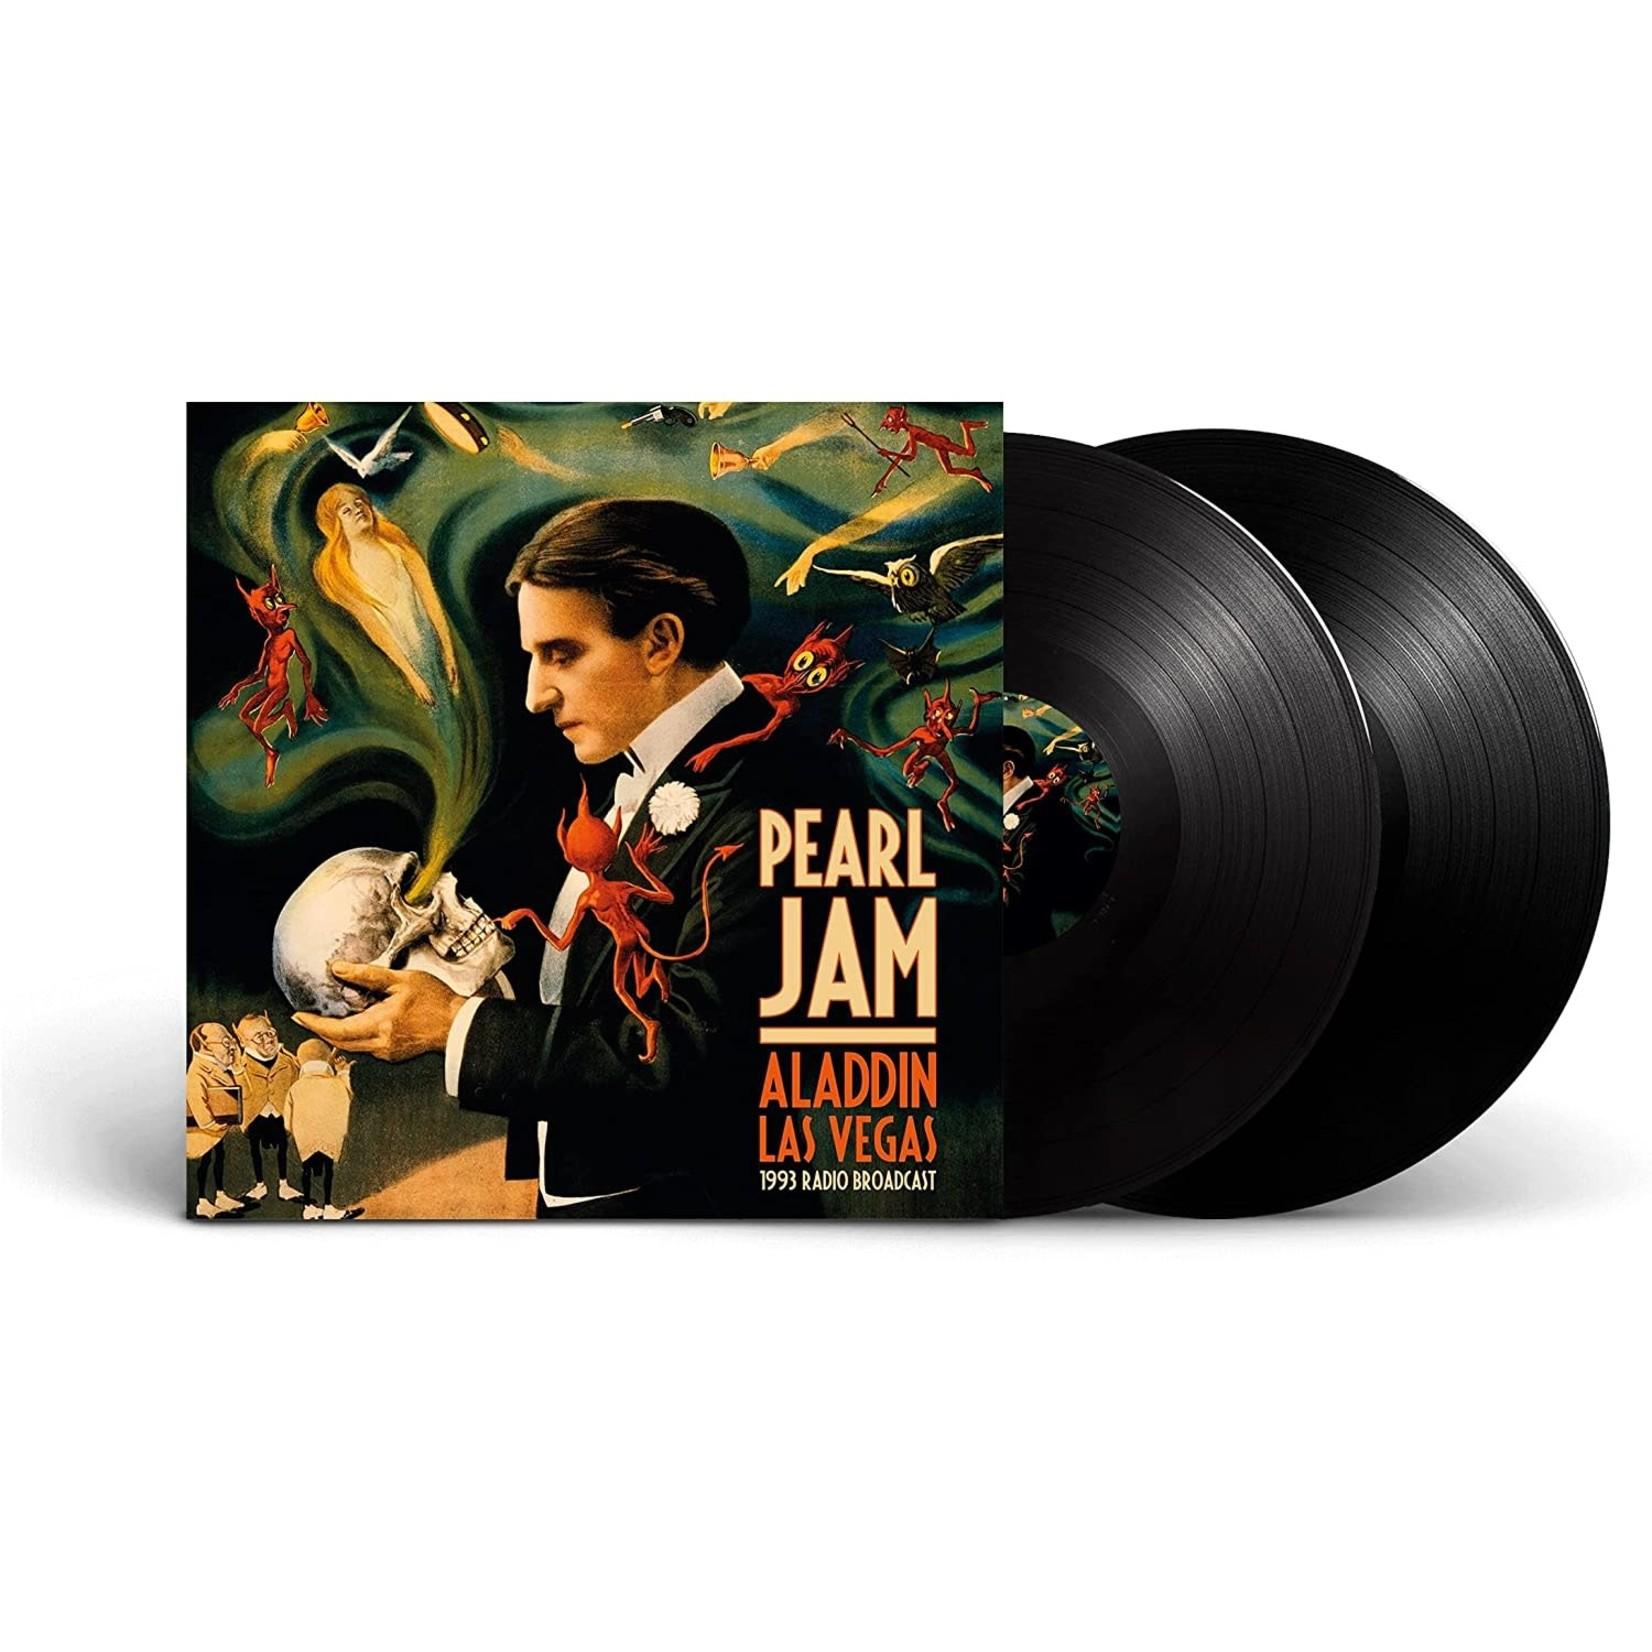 PEARL JAM ALADDIN, LAS VEGAS 1993 (2LP)